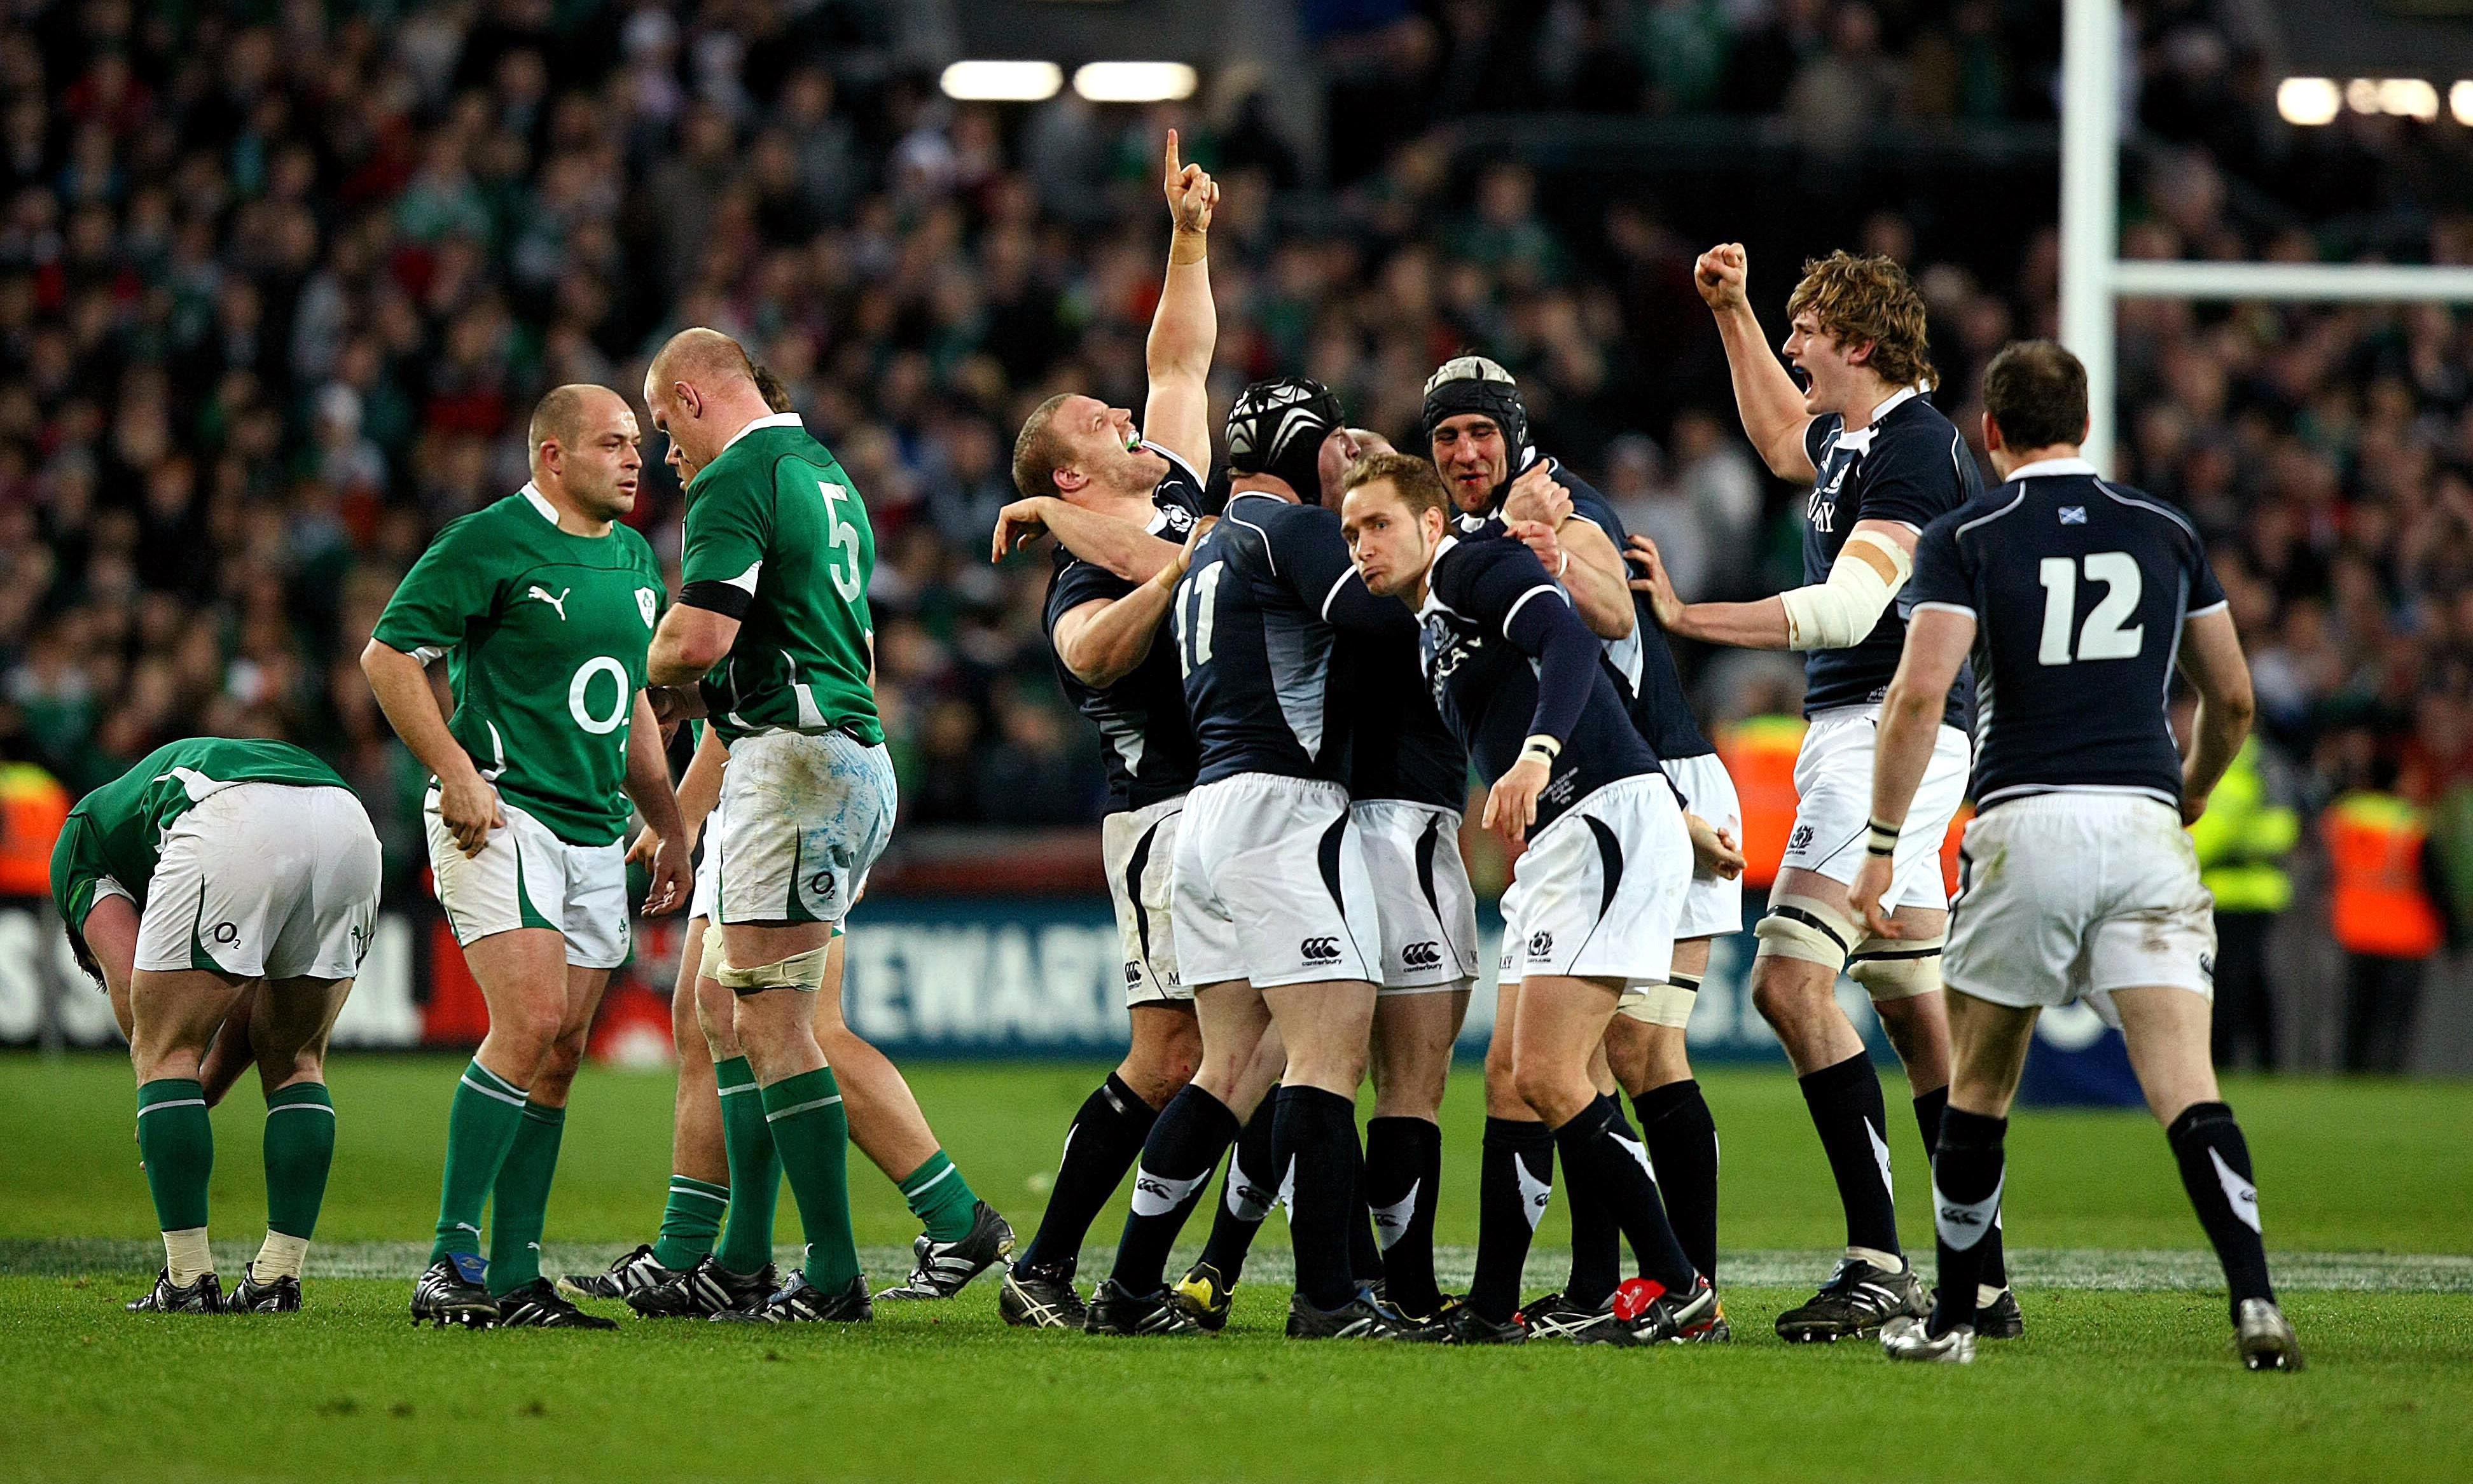 Scotland seeking launchpad with landmark win against Ireland